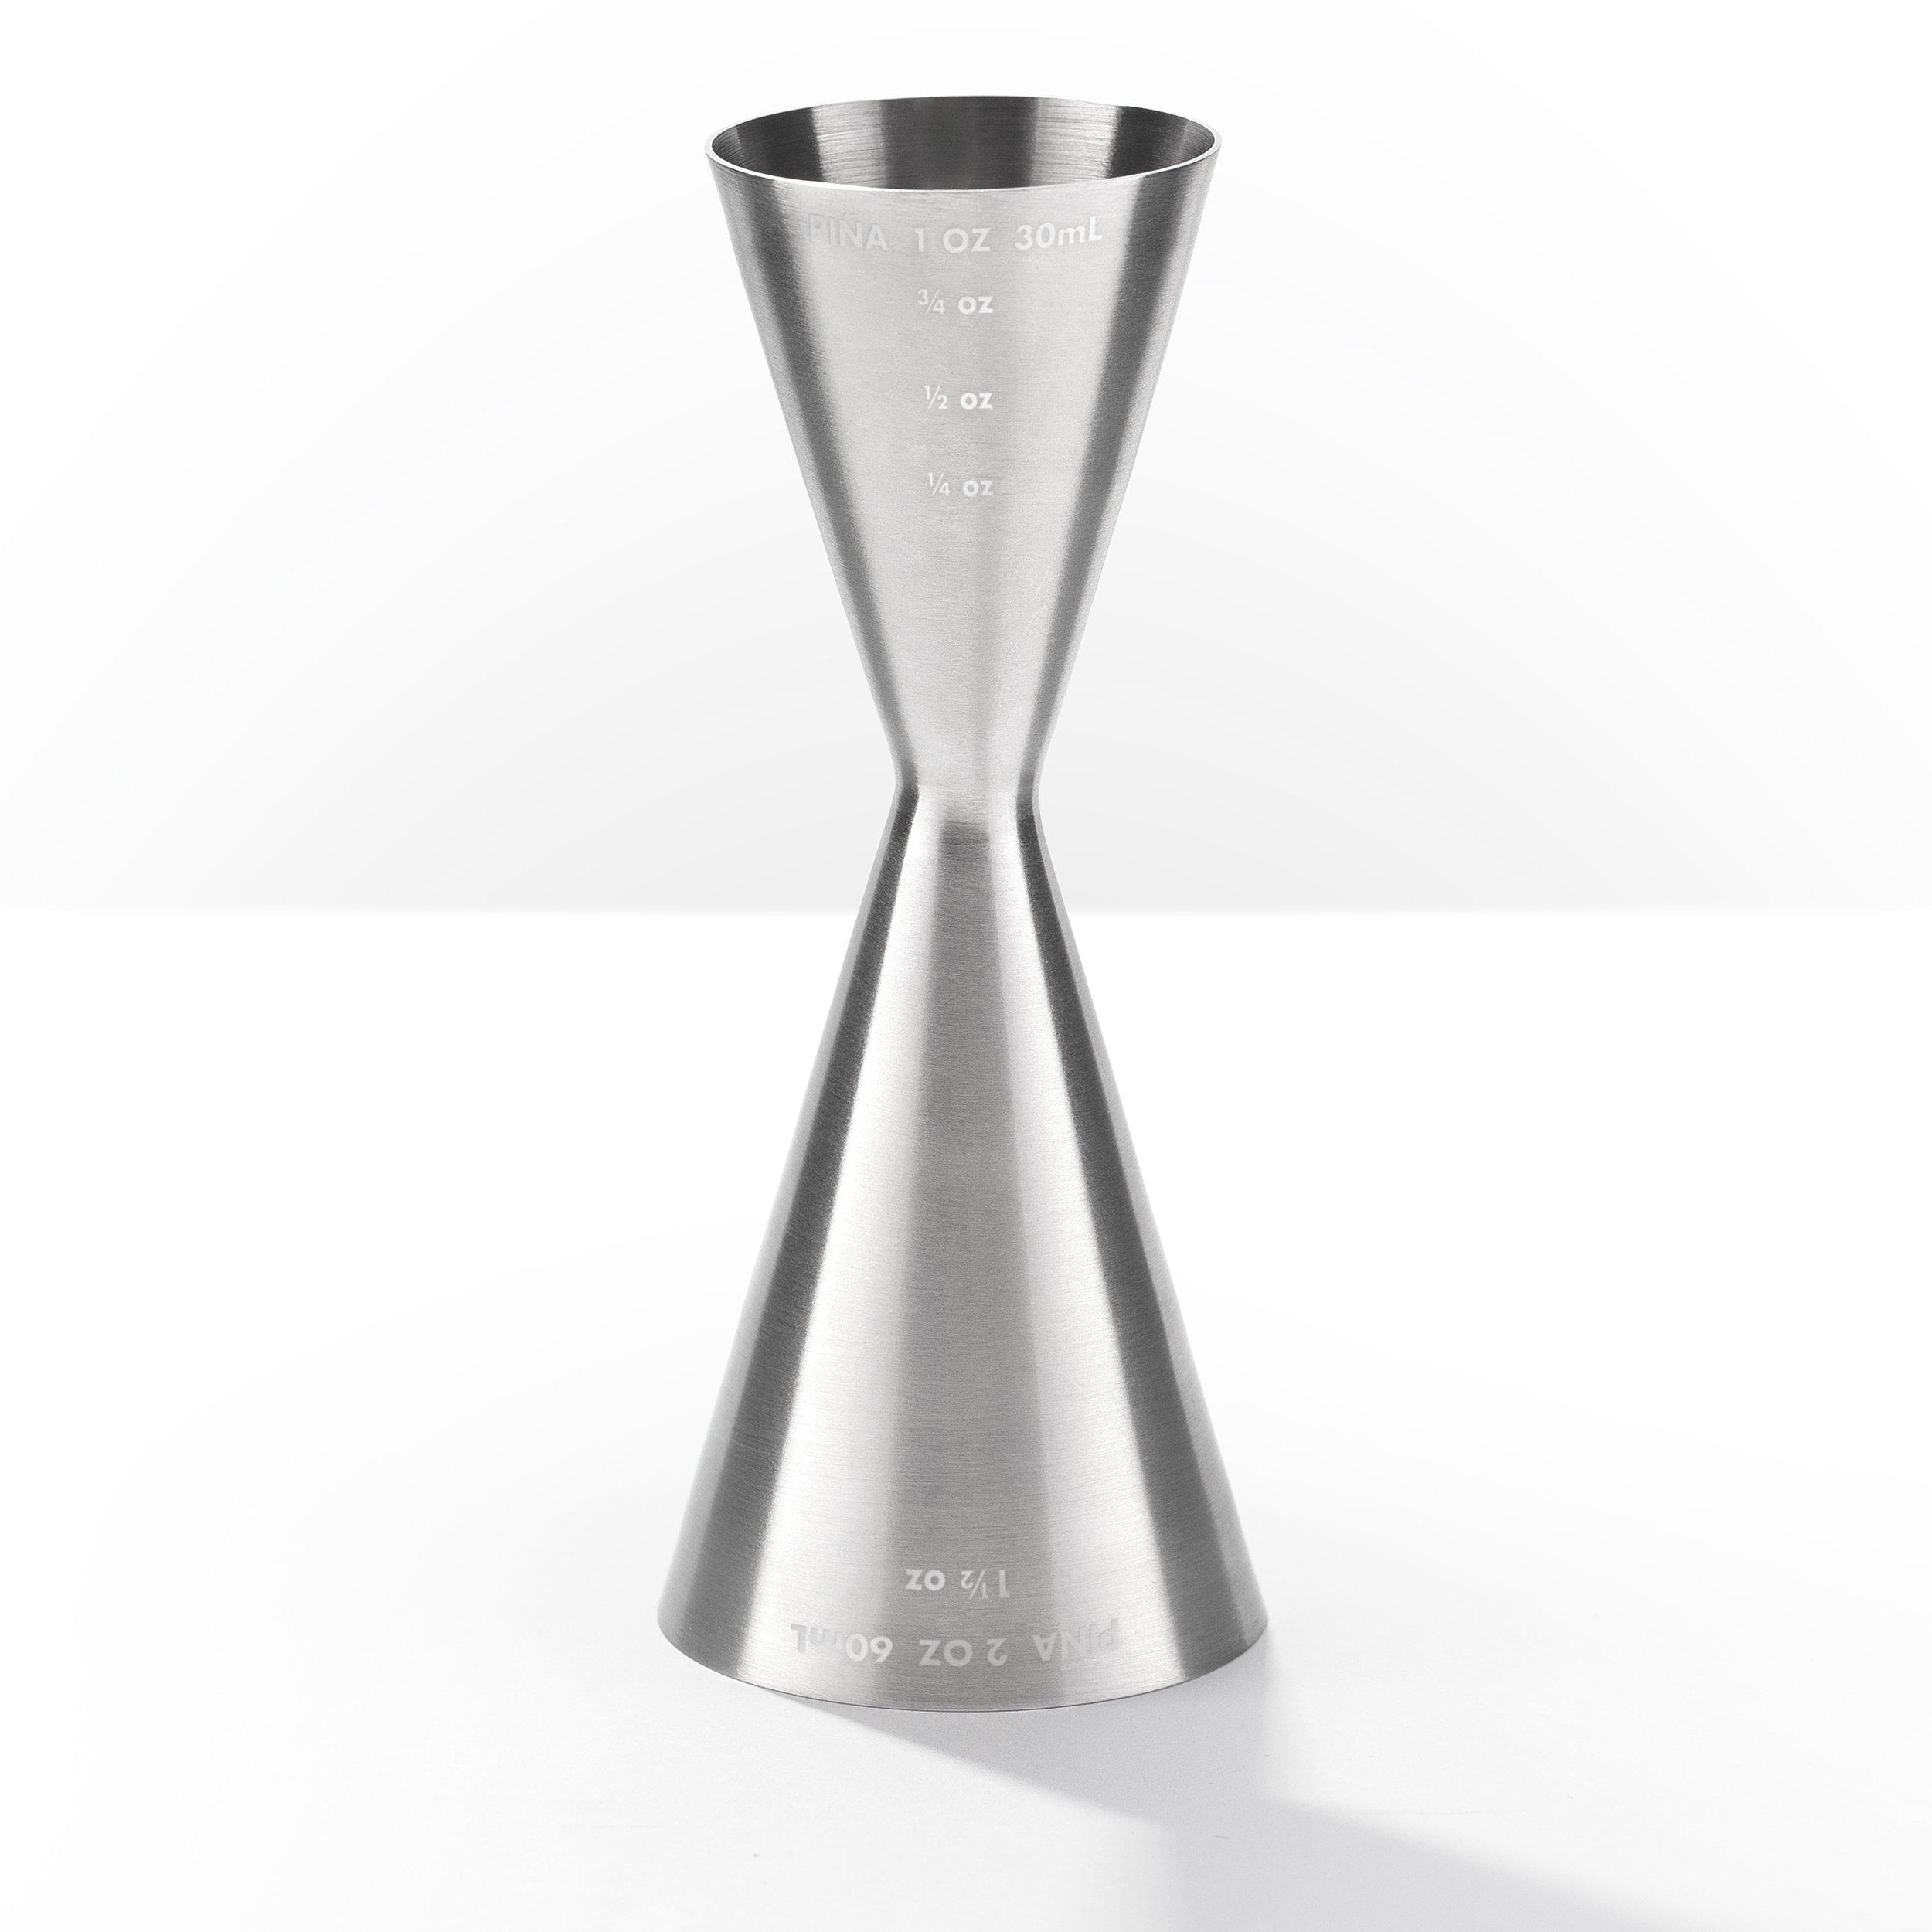 Piña Barware Slim Stainless Steel Commercial 2oz. / 1oz. Slim Style Measuring Jigger Bar Tool